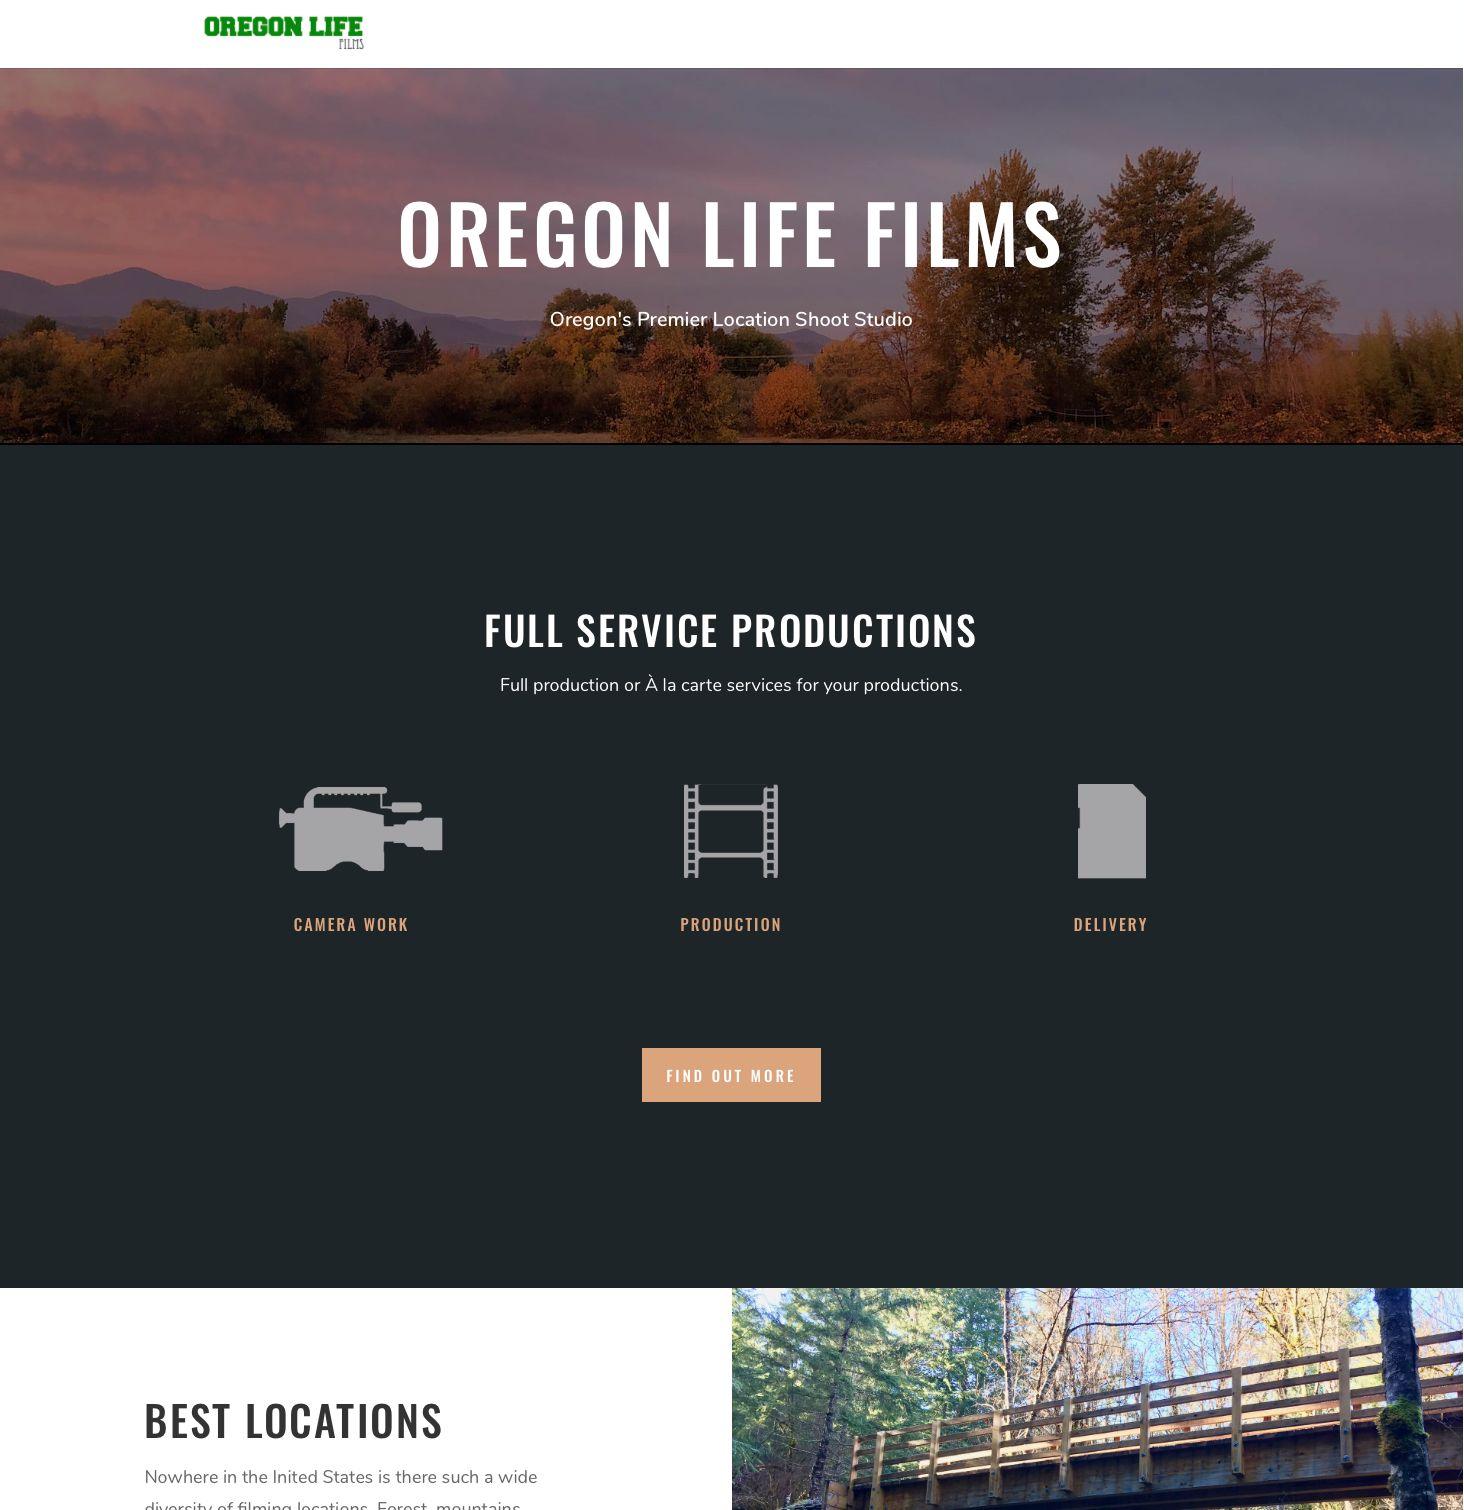 Oregon Life Films